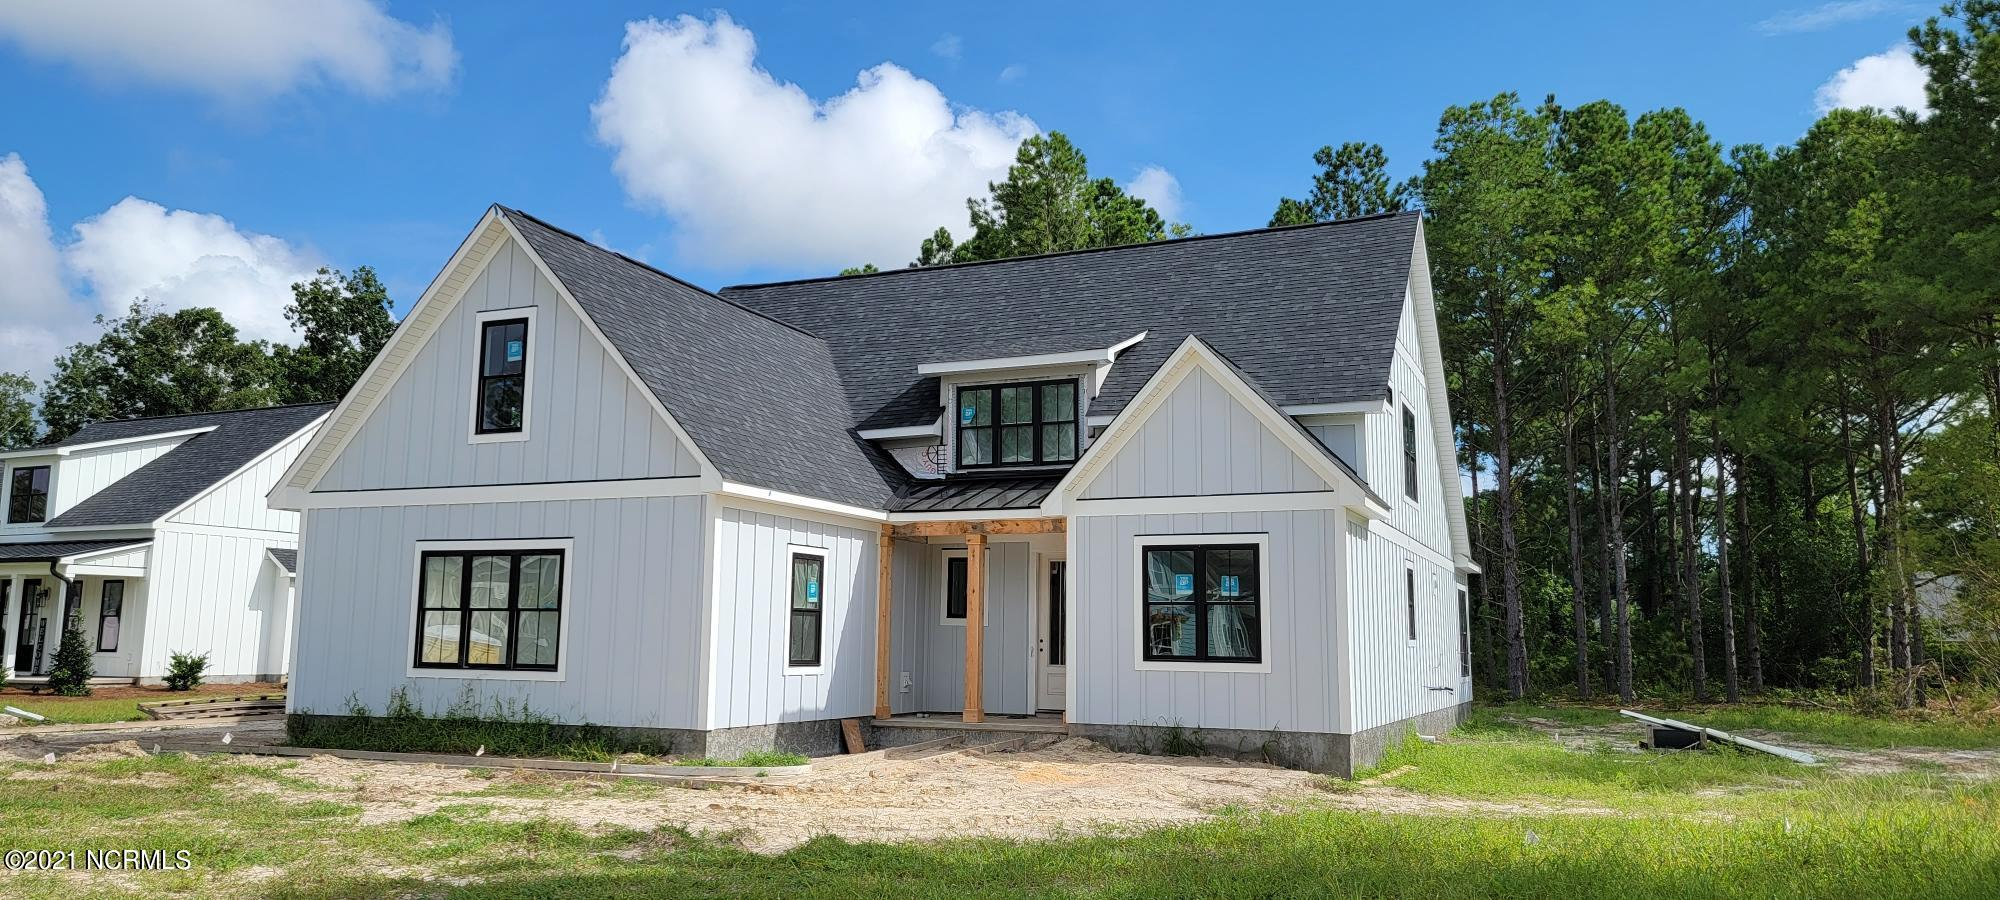 L69 Berkshire Lane, Hampstead, North Carolina 28443, 4 Bedrooms Bedrooms, 11 Rooms Rooms,4 BathroomsBathrooms,Single family residence,For sale,Berkshire,100253428